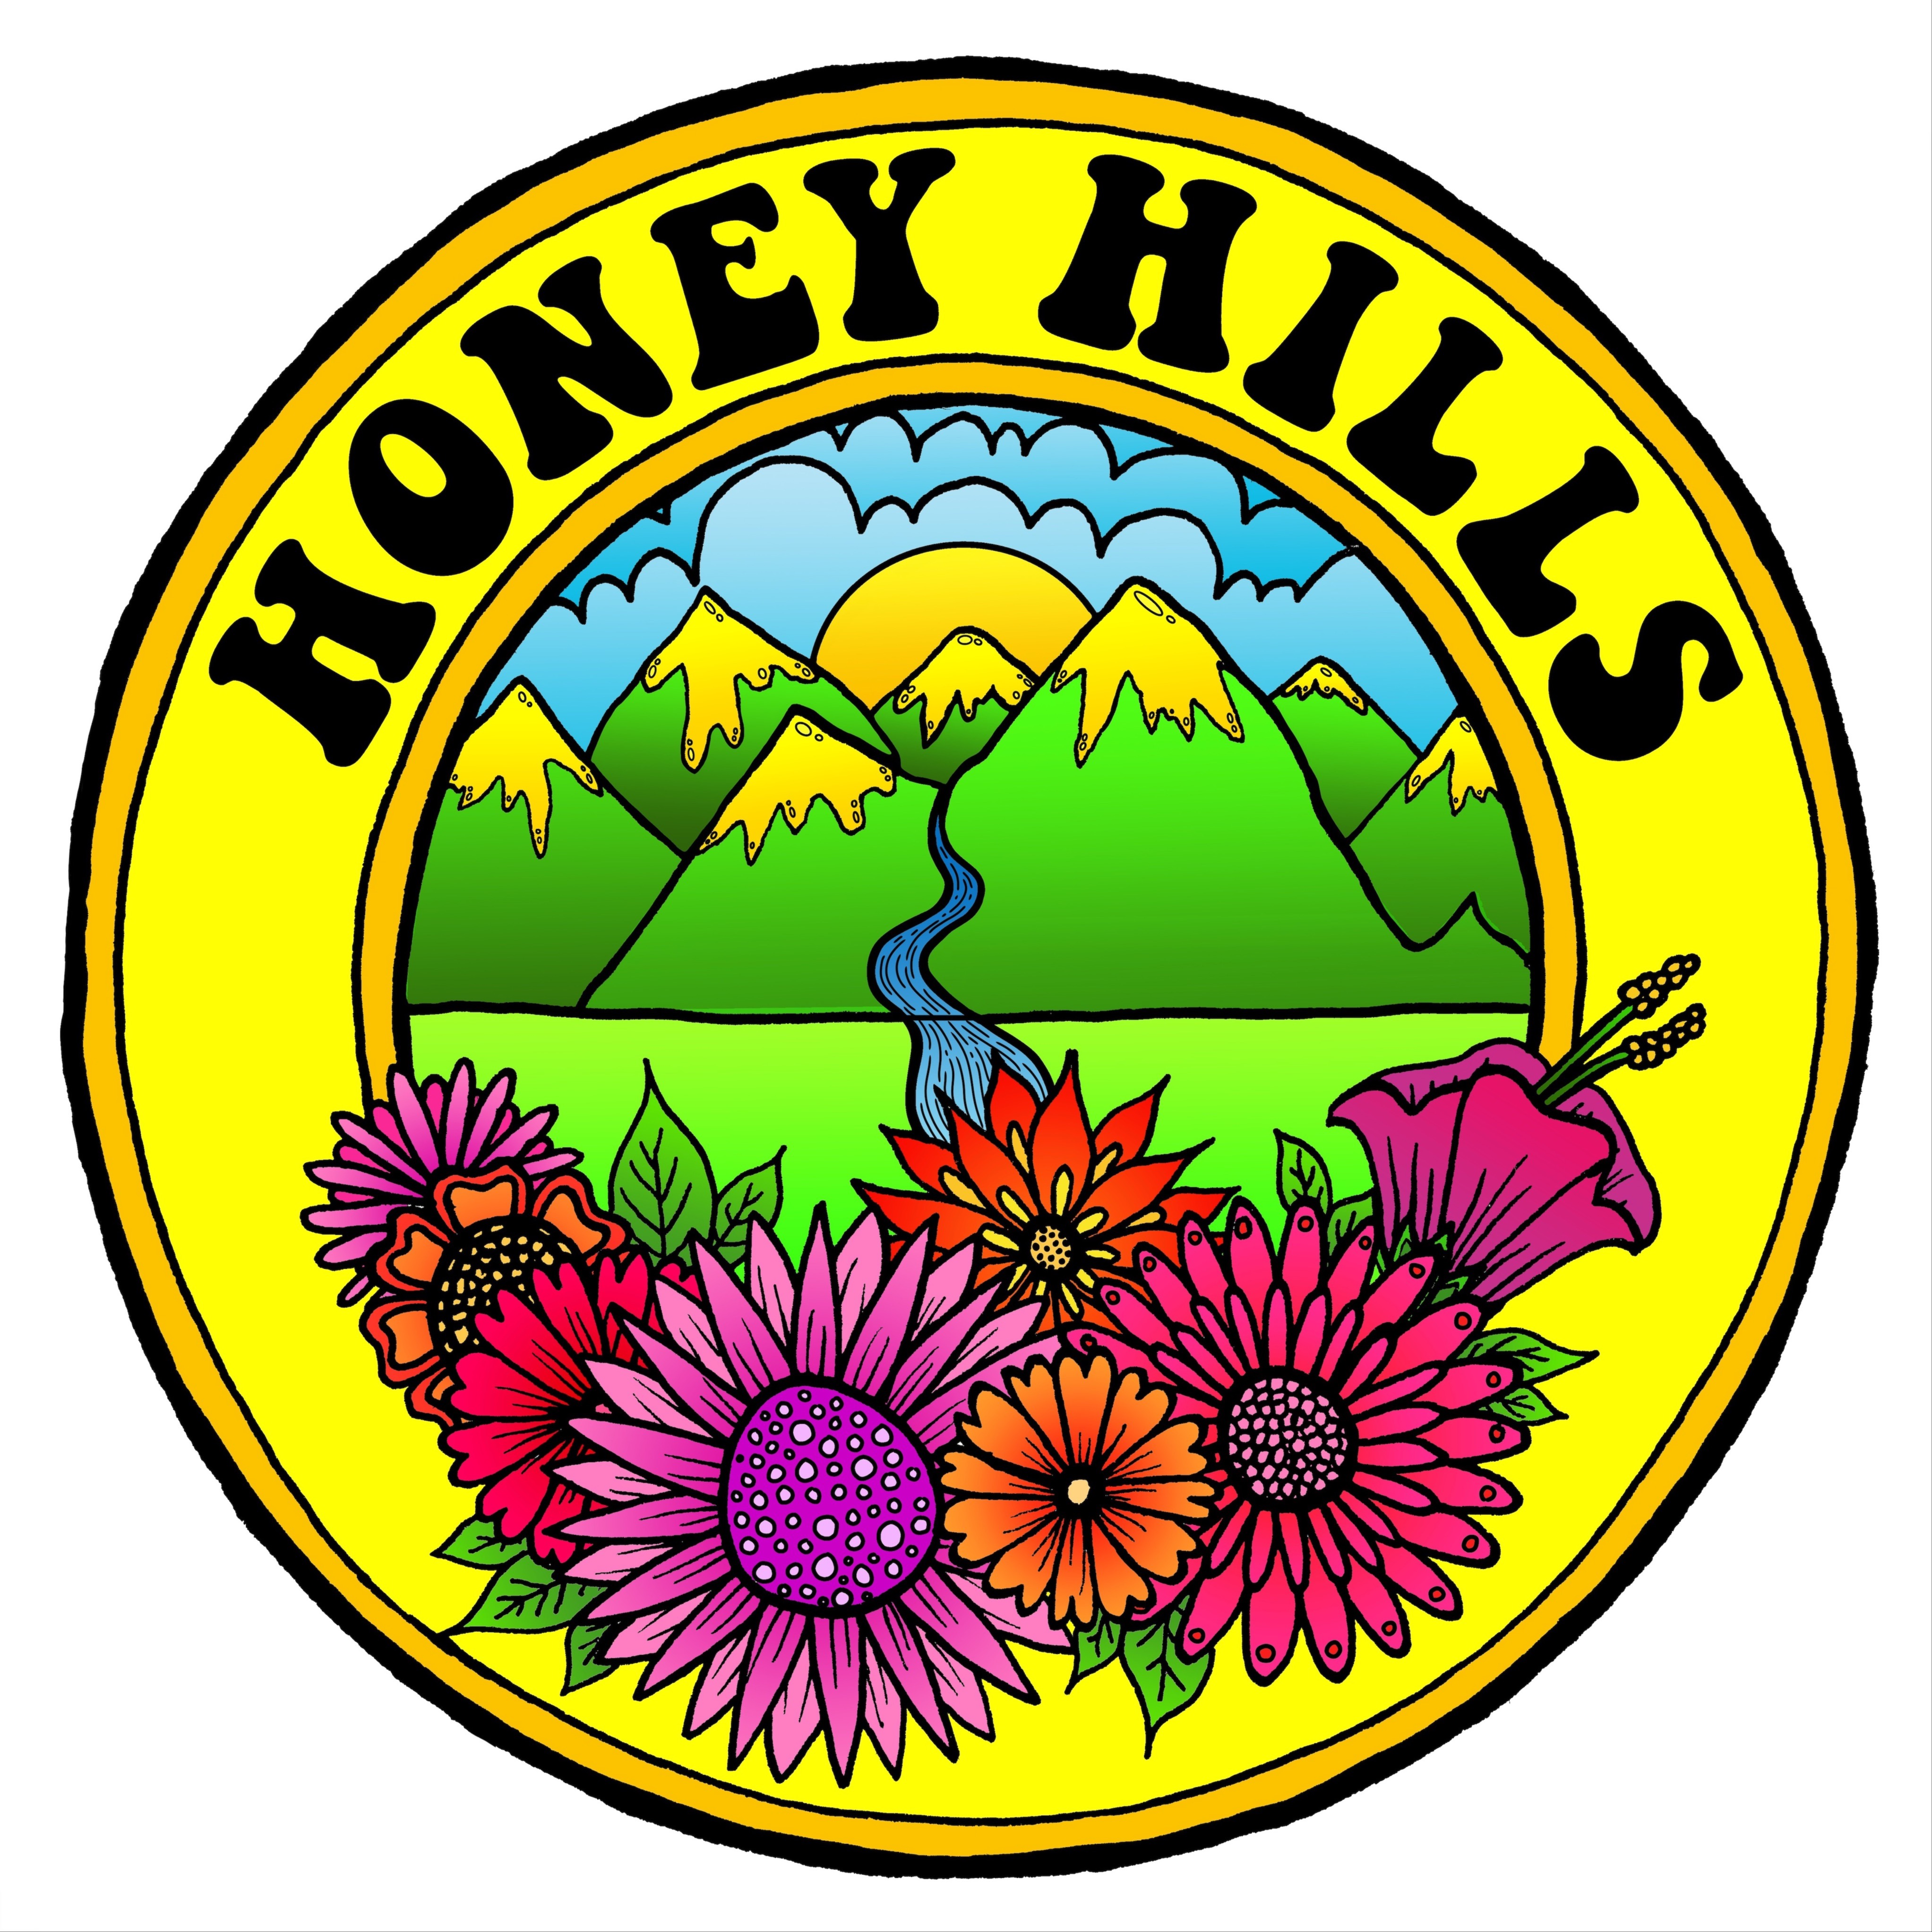 @honeyhillsband Profile Image | Linktree